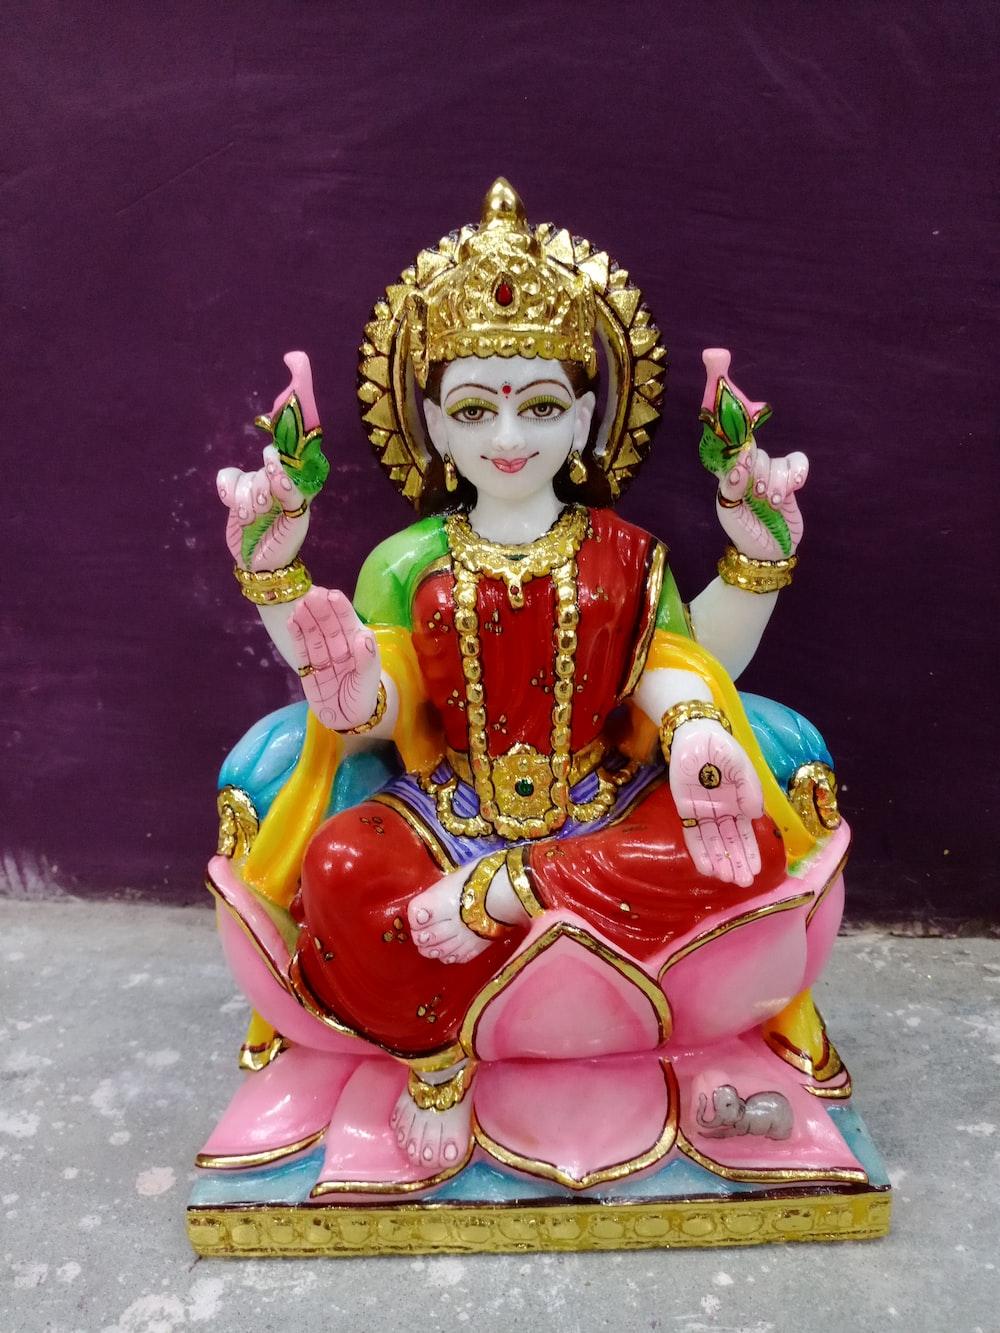 Lakshmi Pictures Download Free Images On Unsplash